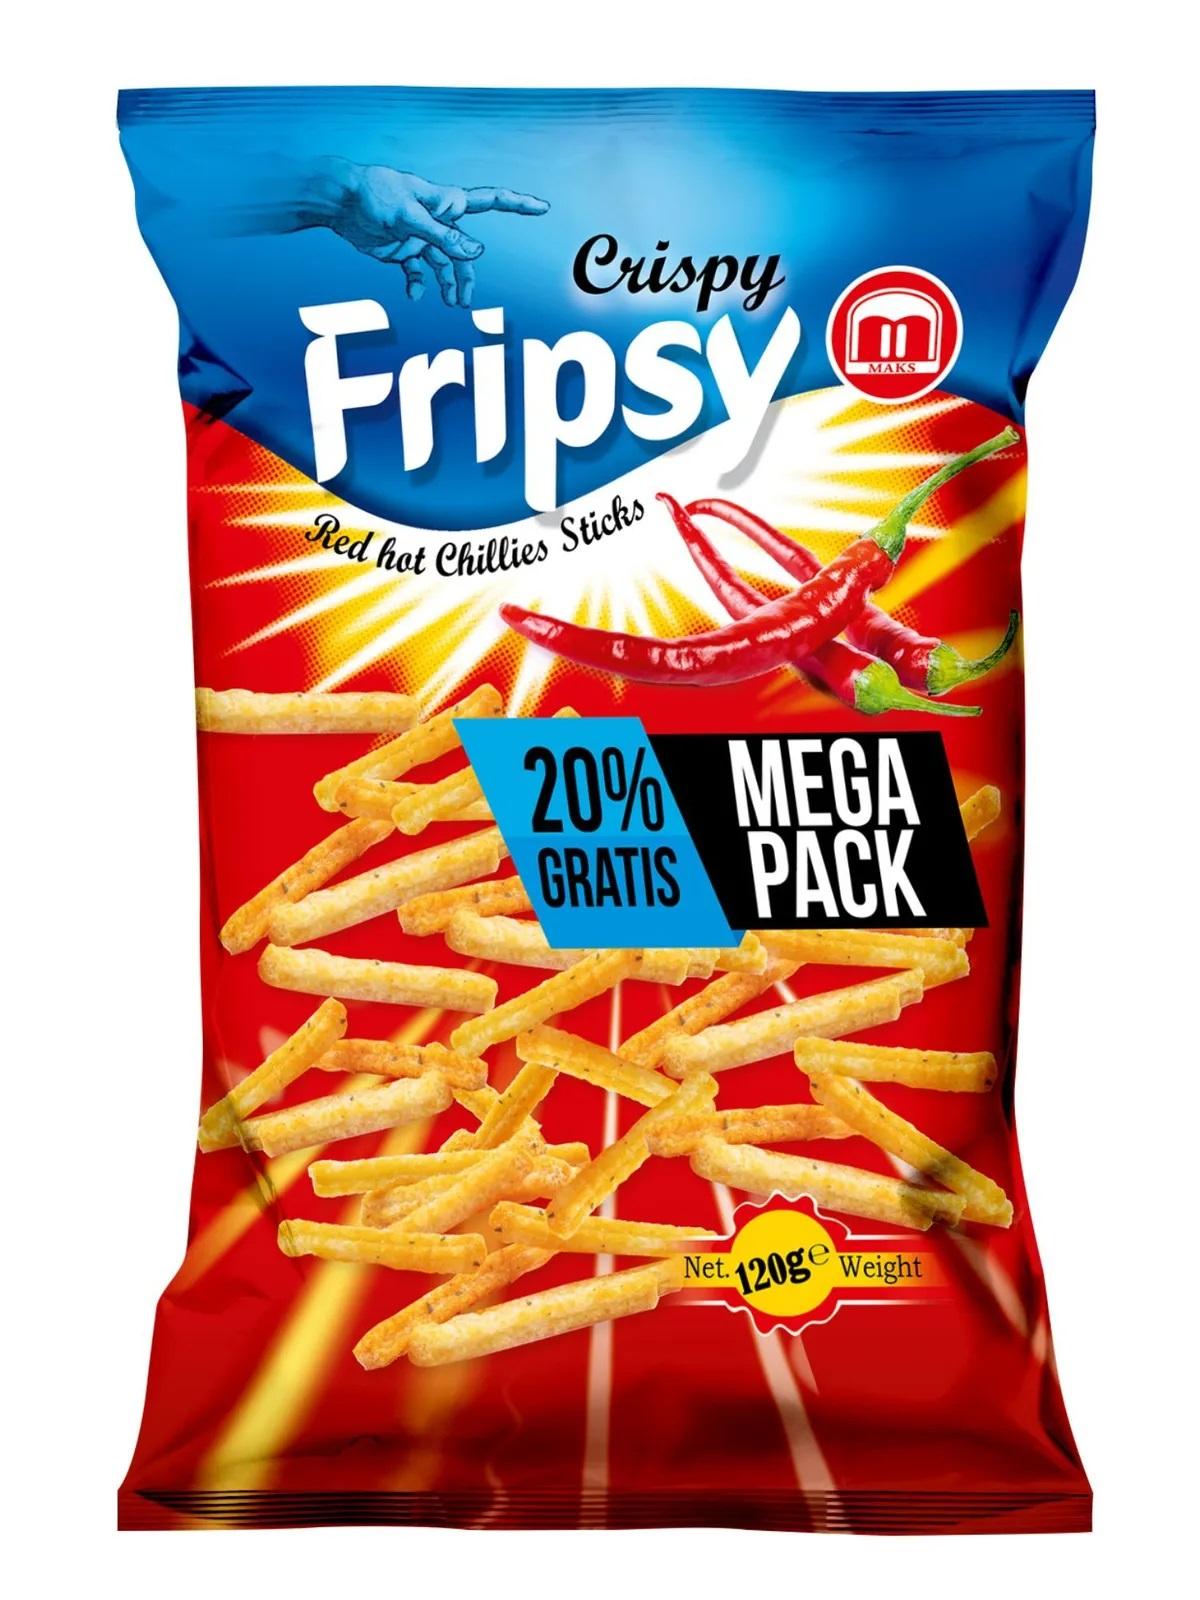 Crispy Fripsy Red Hot Chilli 120g